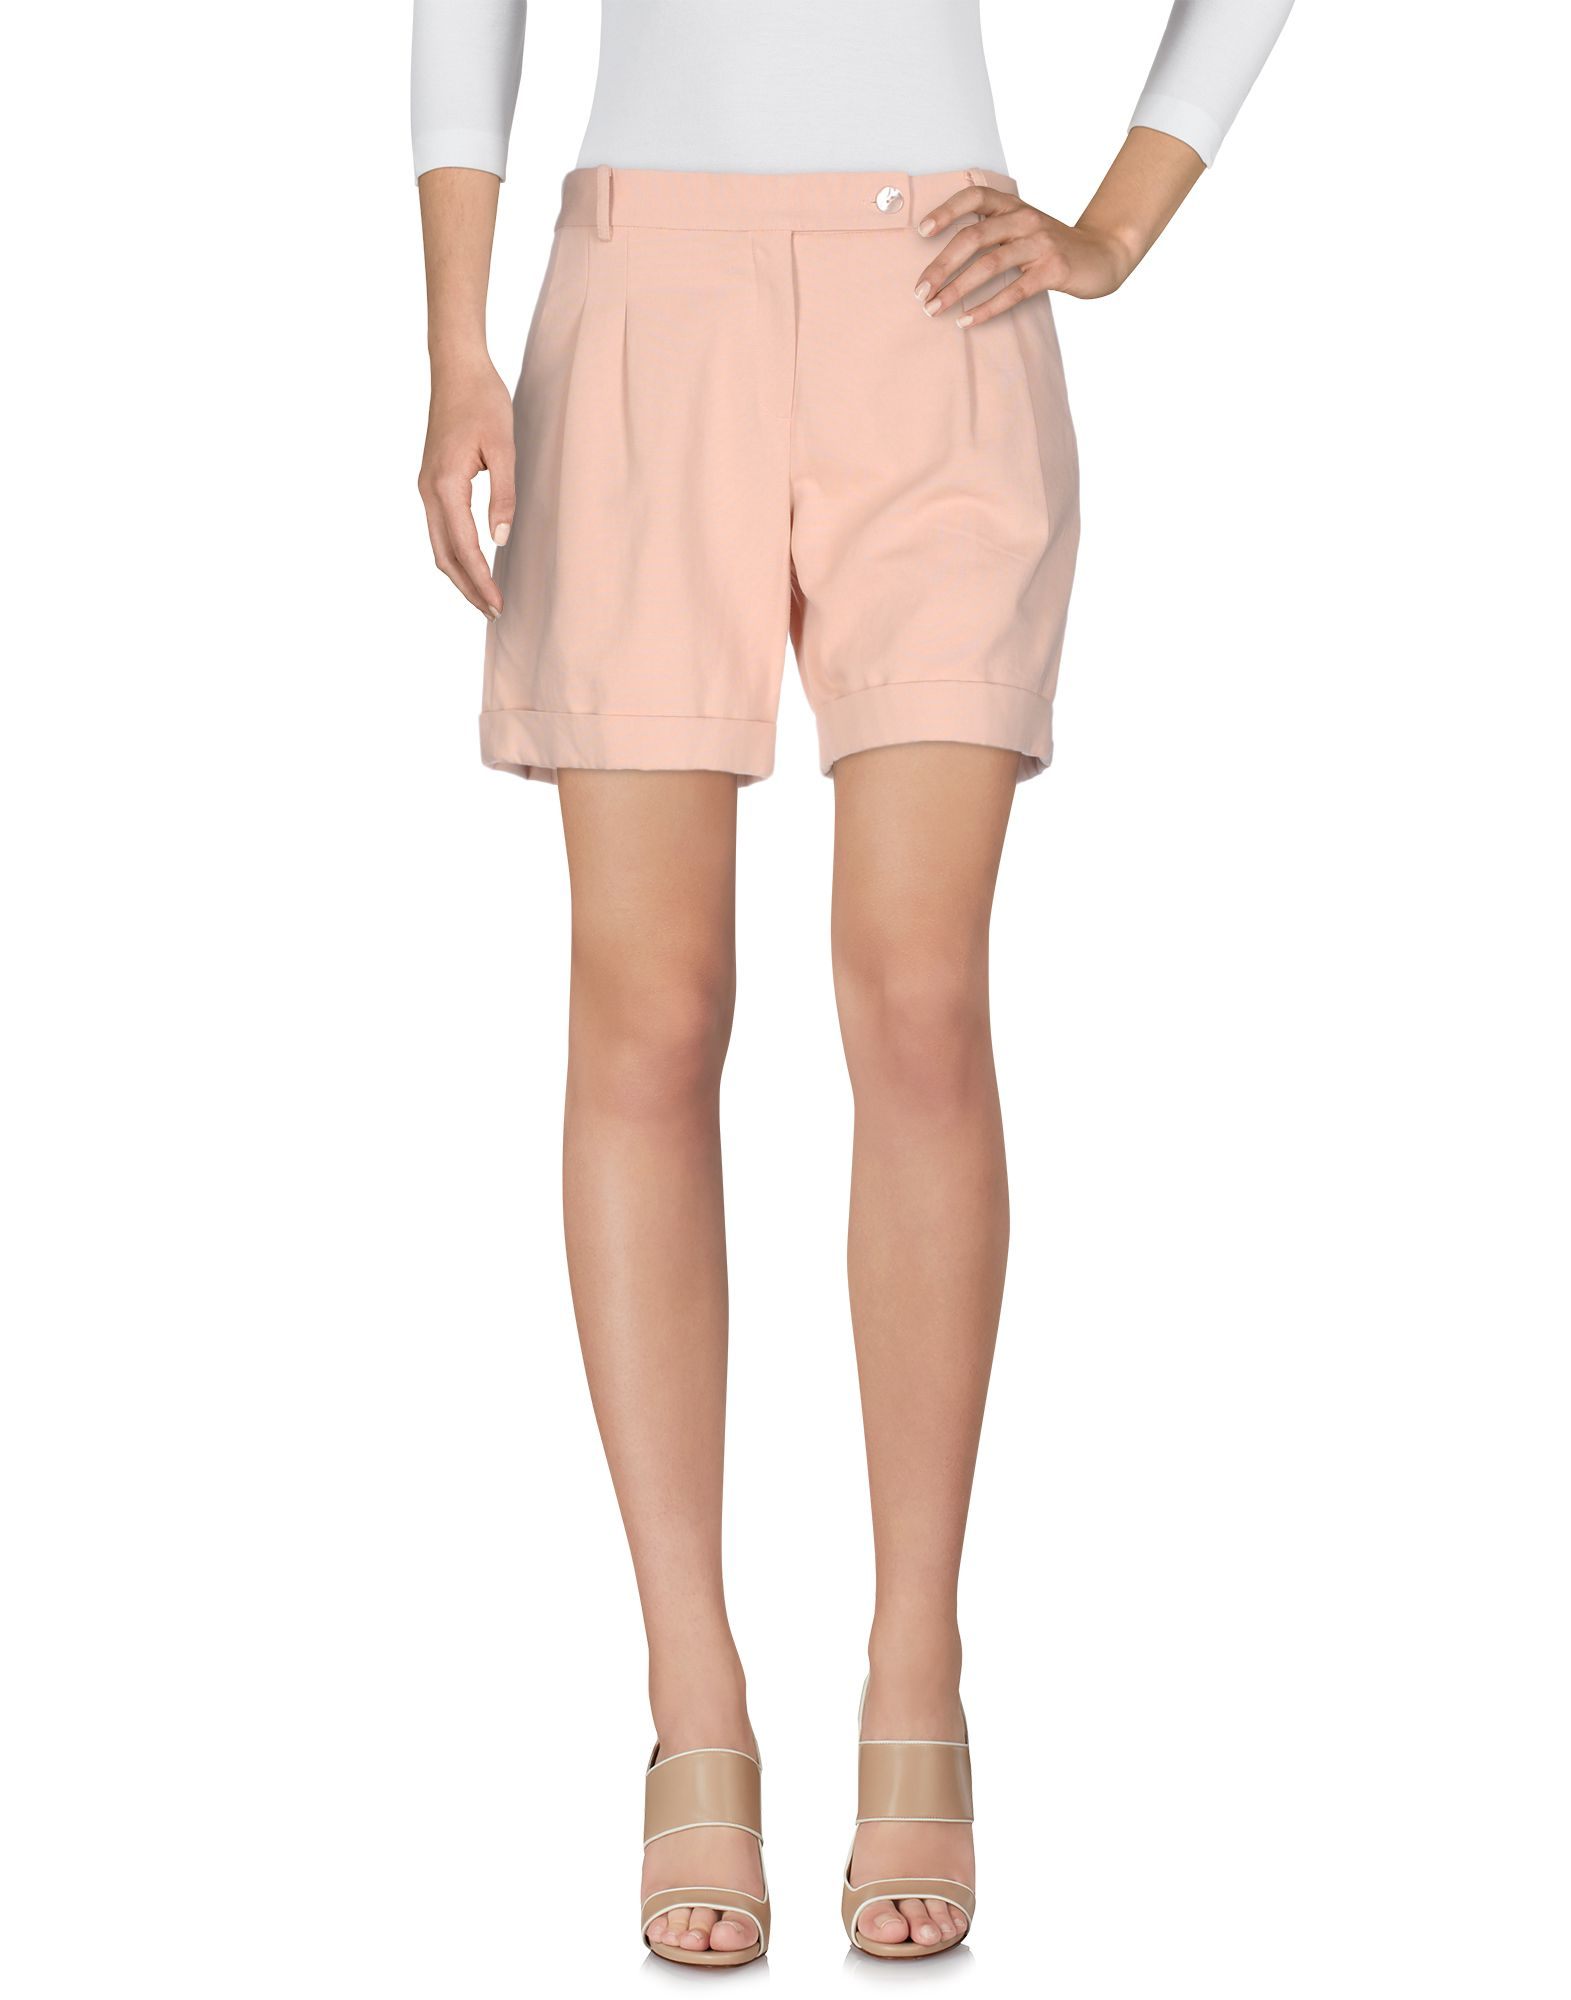 Pantalone Classico Blumarine Donna - Acquista online su 9isEyQ